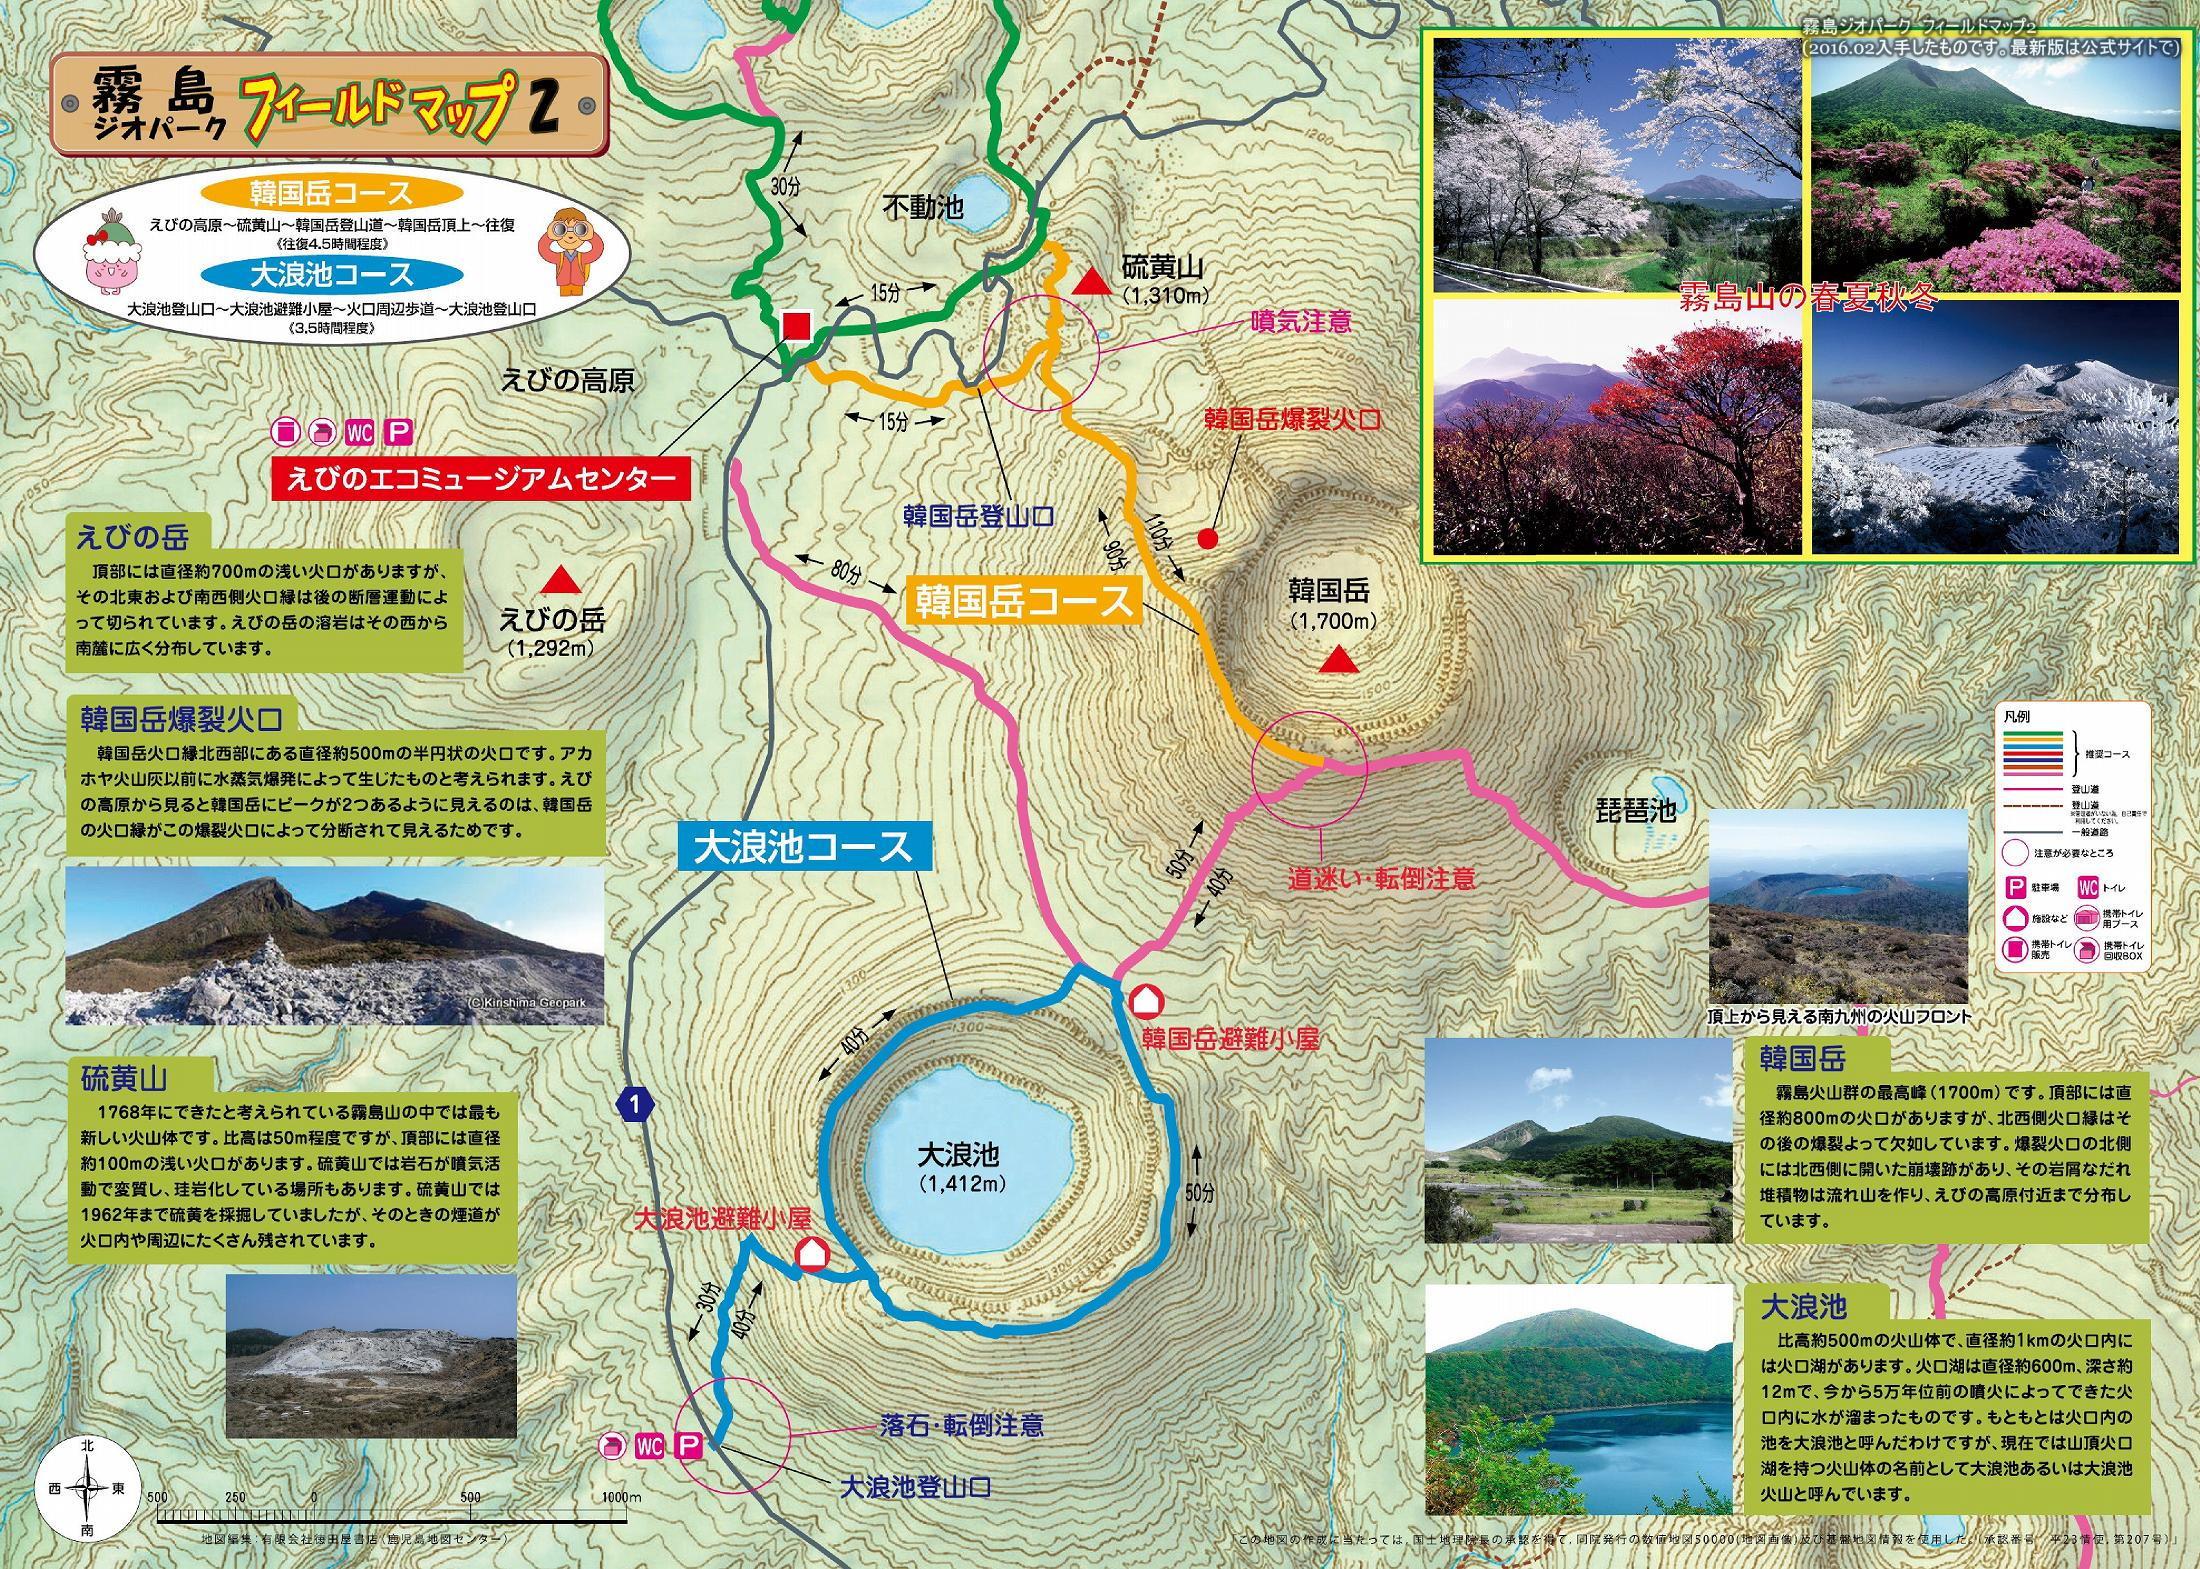 923953e5e8 霧島ジオパークフィールドマップ2 (韓国岳・大浪池)